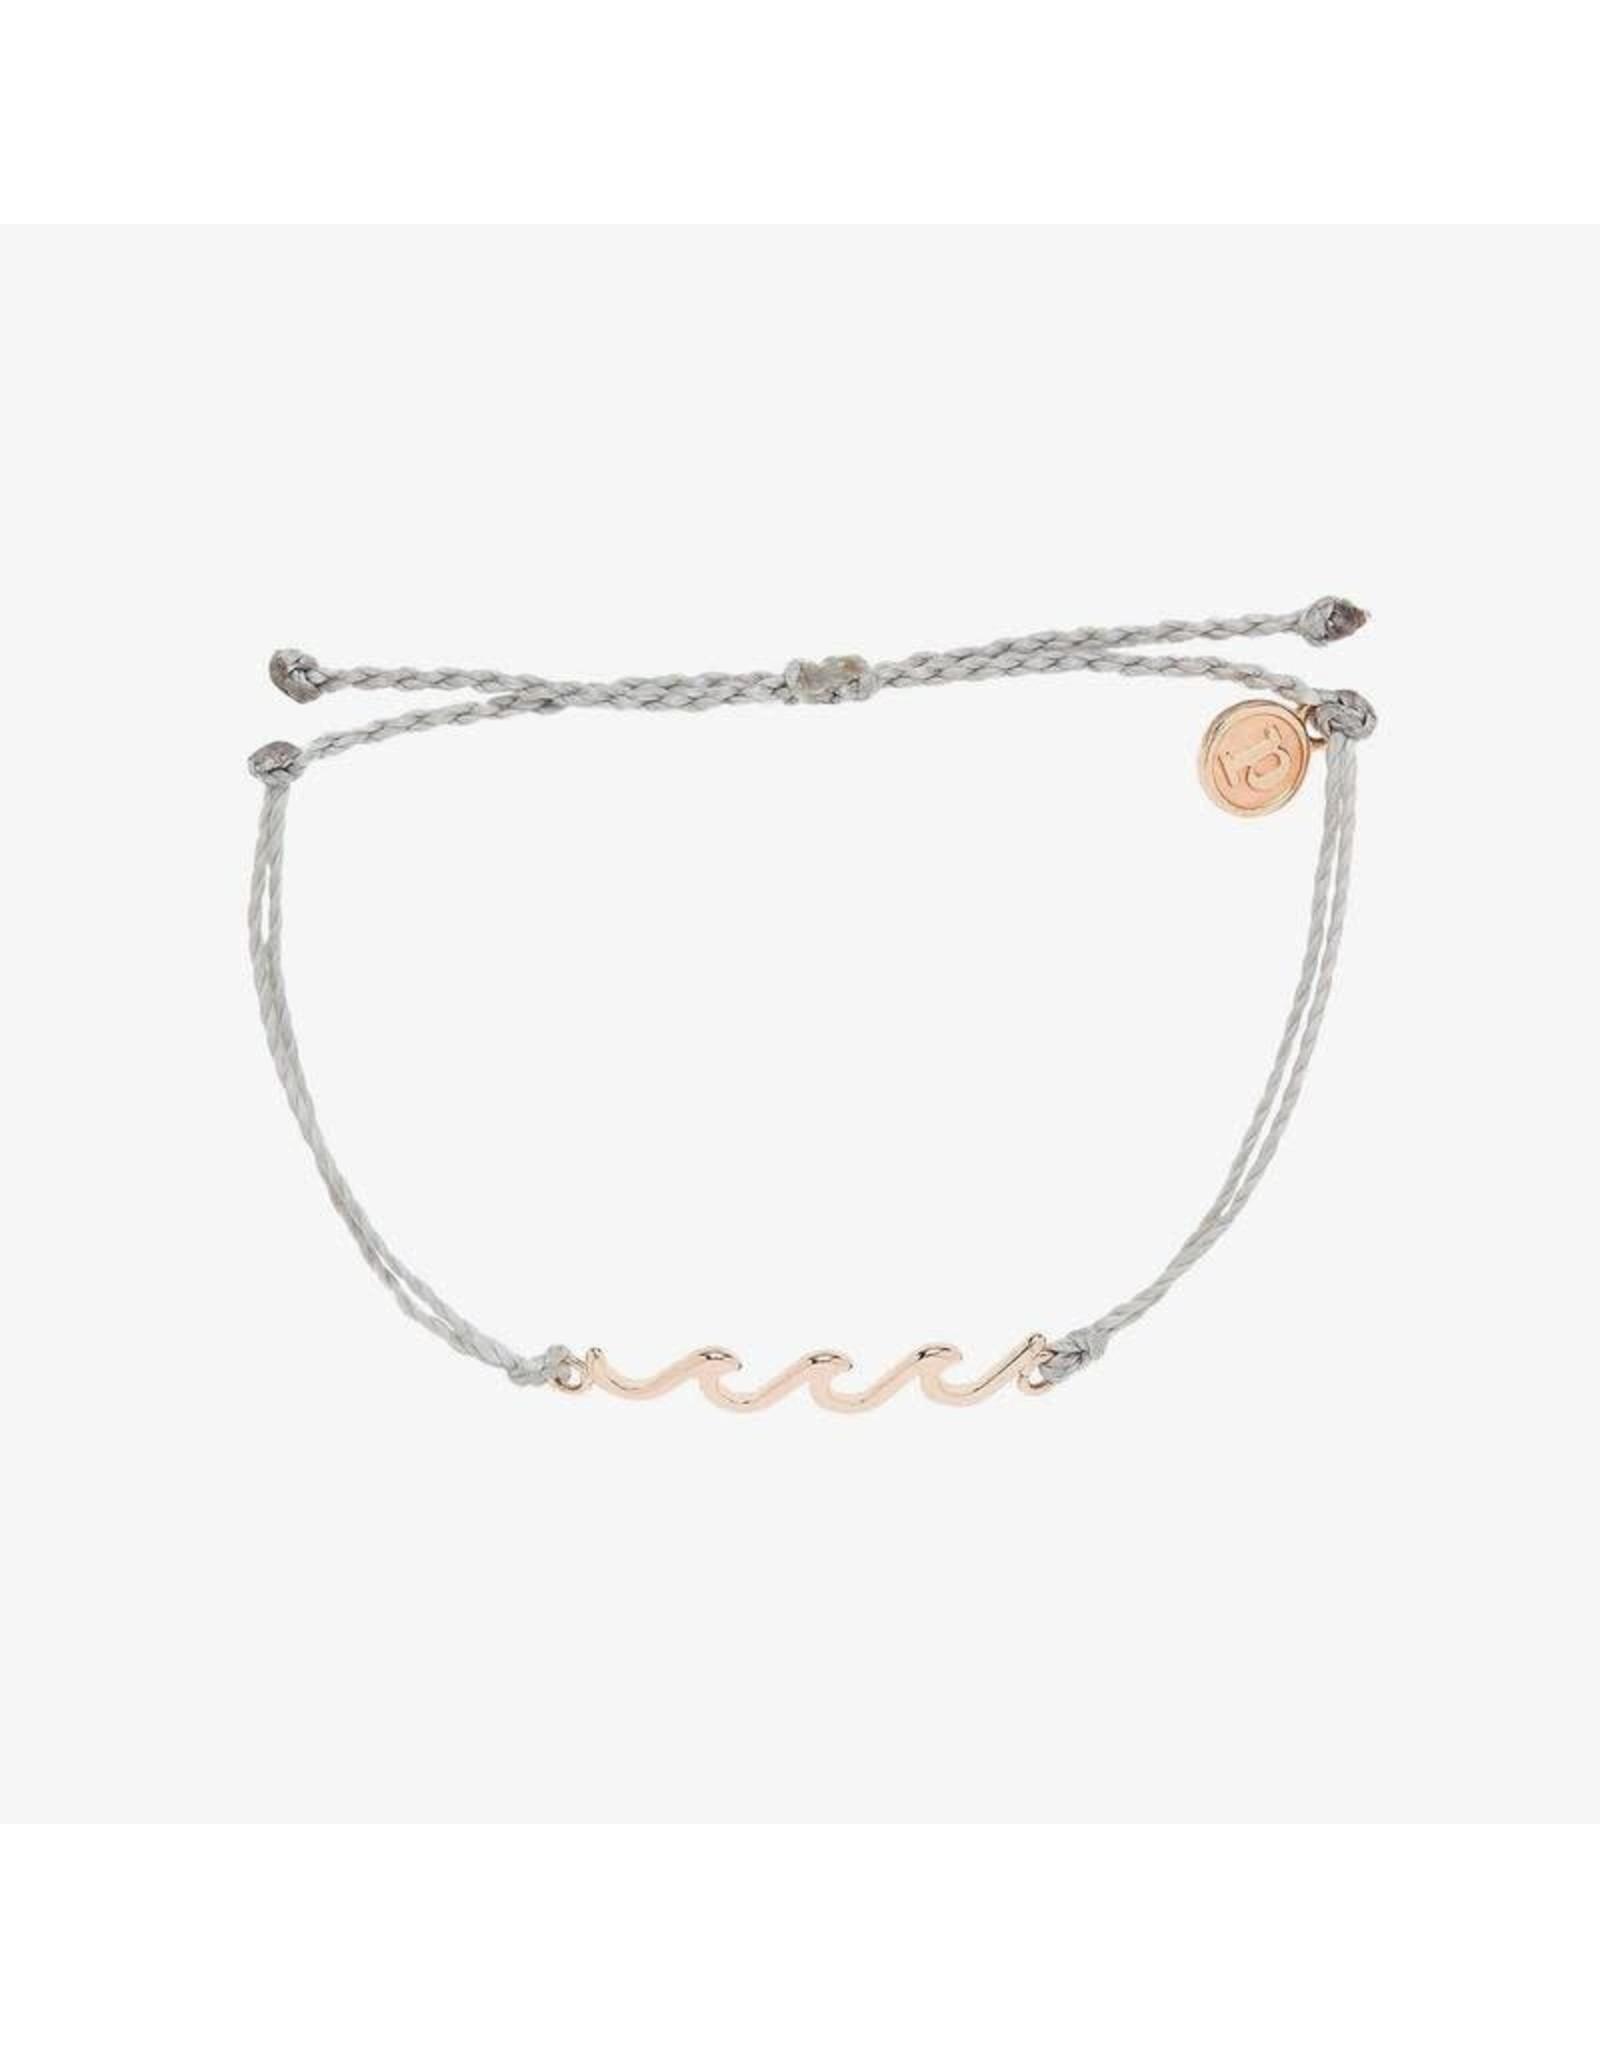 Pura Vida Rose Gold Delicate Wave Bracelet